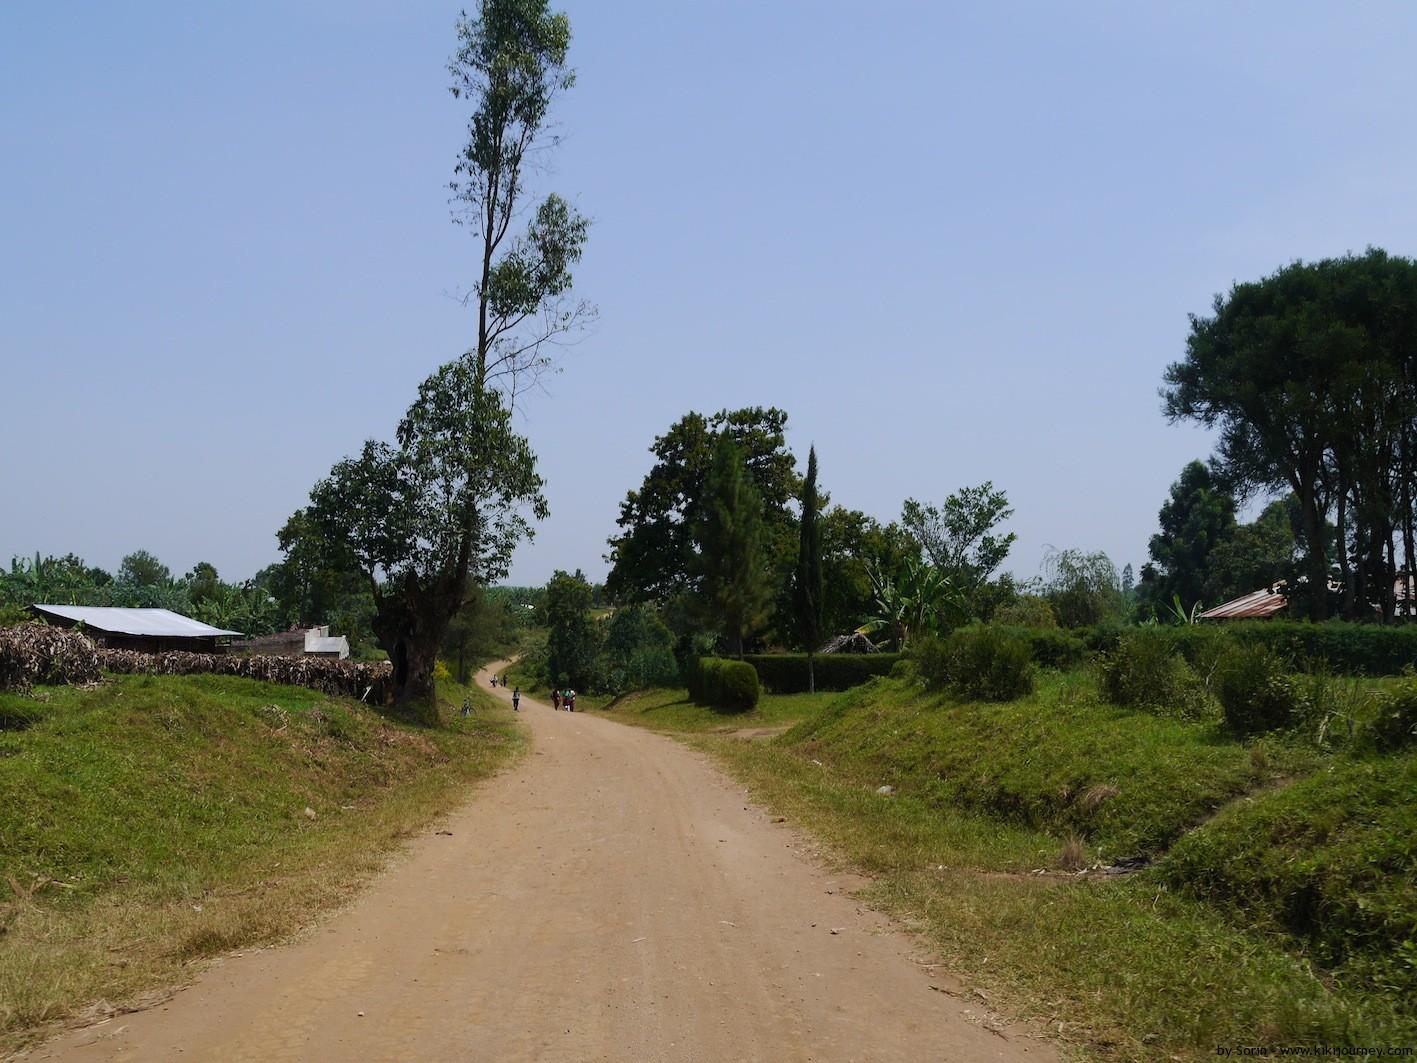 Rural Road in Uganda